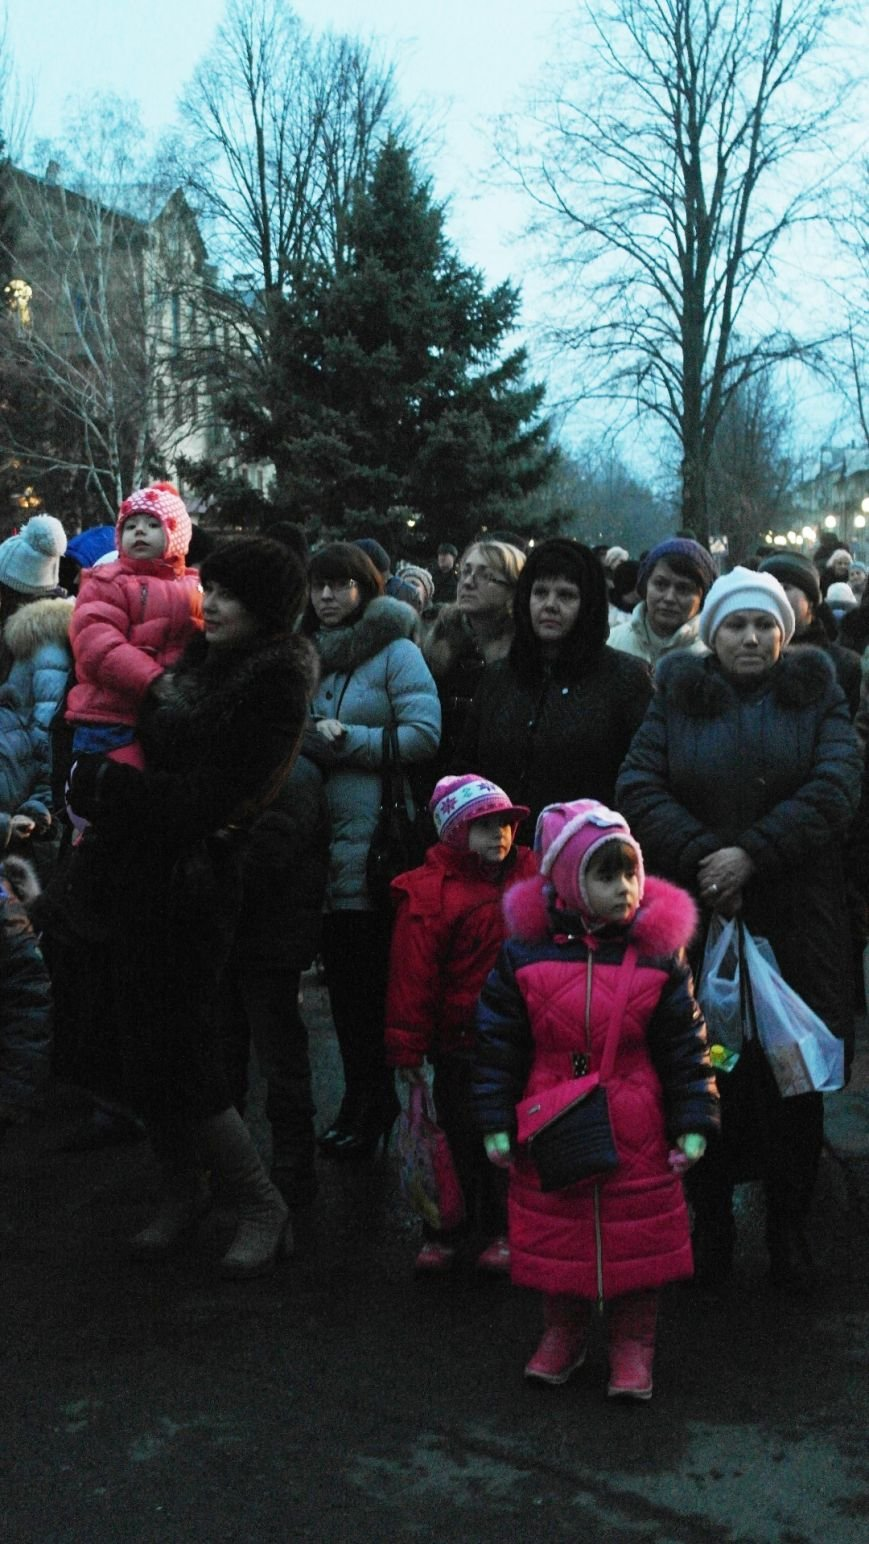 «Раз, два, три…» В Красноармейске «зажглась» Новогодняя елка, фото-16